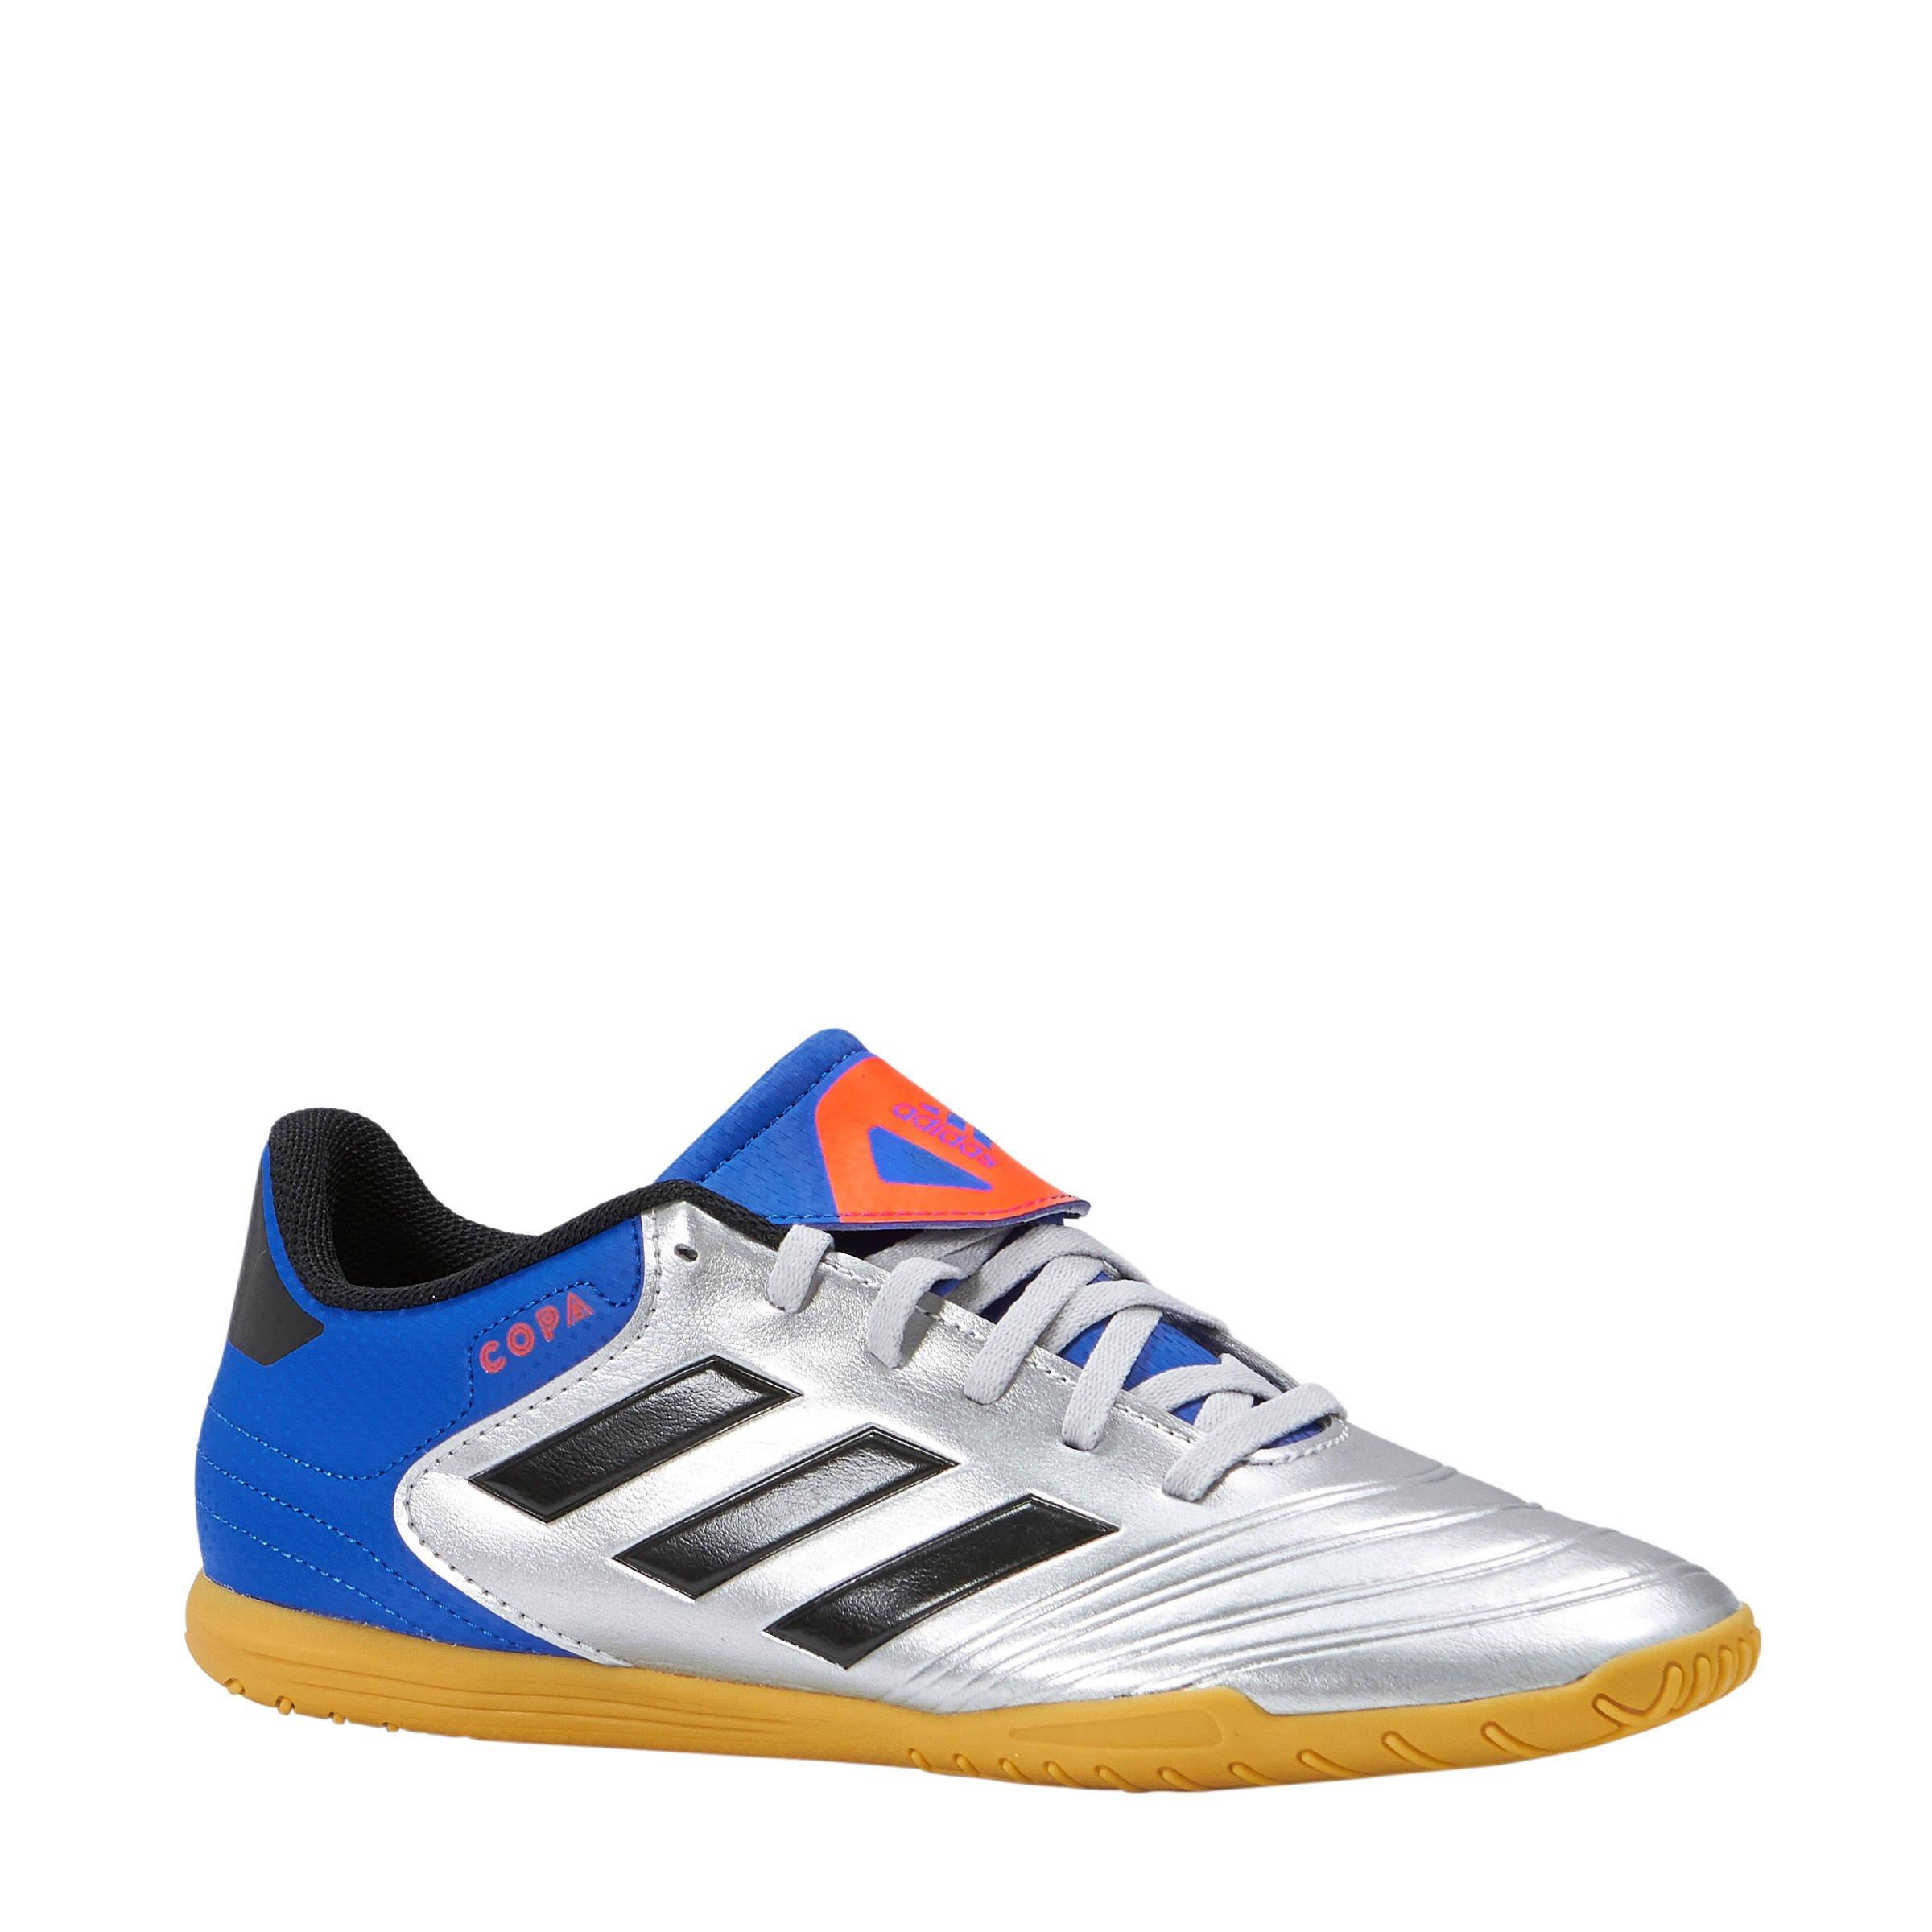 331328f9abe adidas-performance-copa-tango-18-4-in-zaalvoetbalschoenen-zilver-zilver-4059811863720.jpg